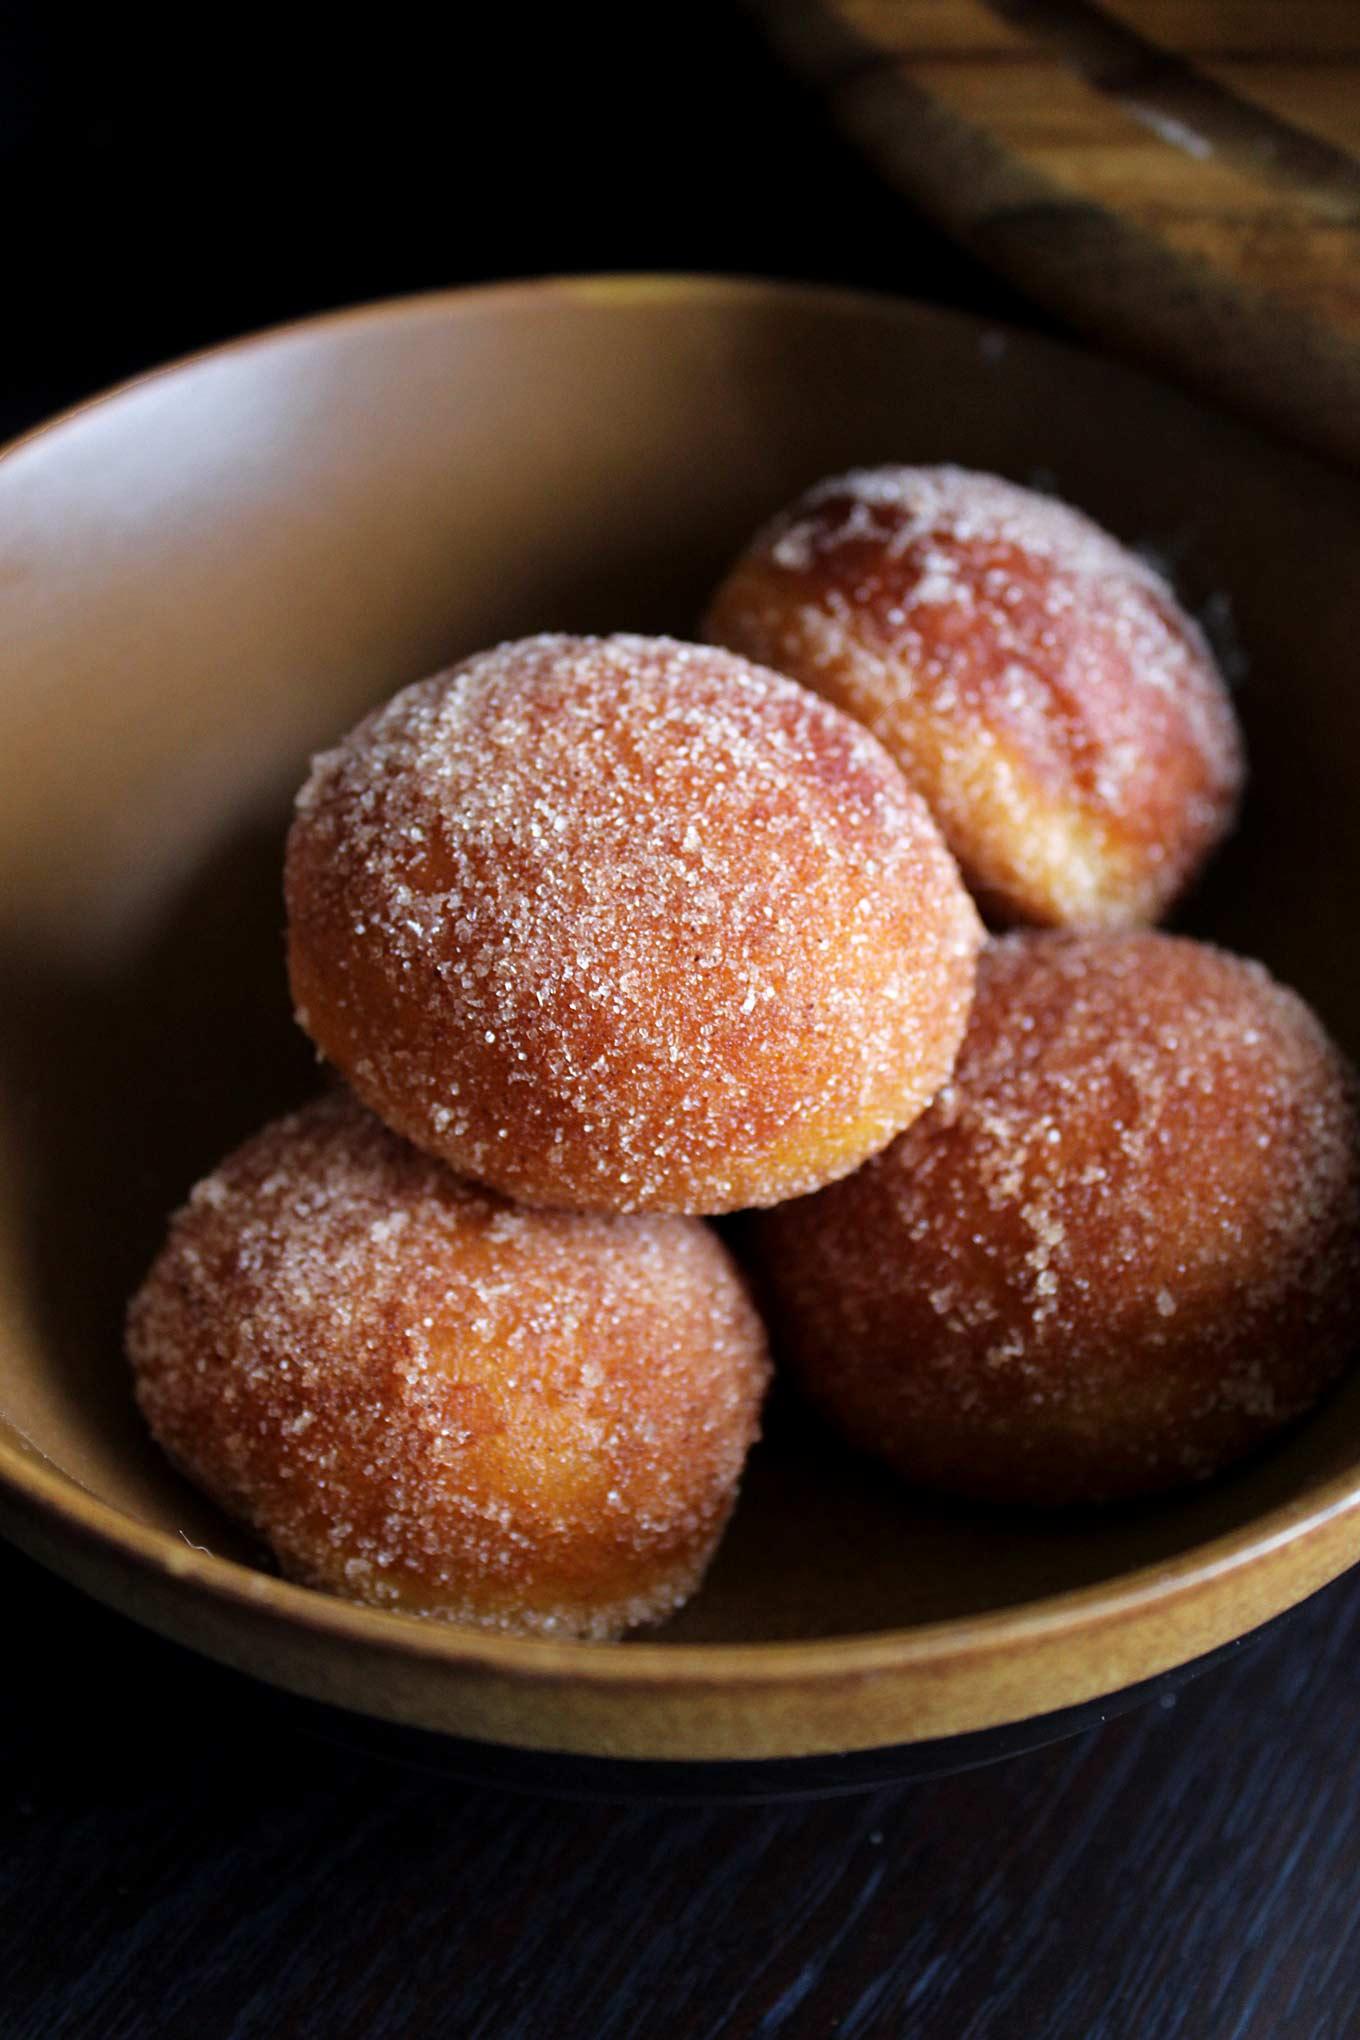 Chocolate Glazed Donuts & Cinnamon Sugar Donut Holes | wyldflour